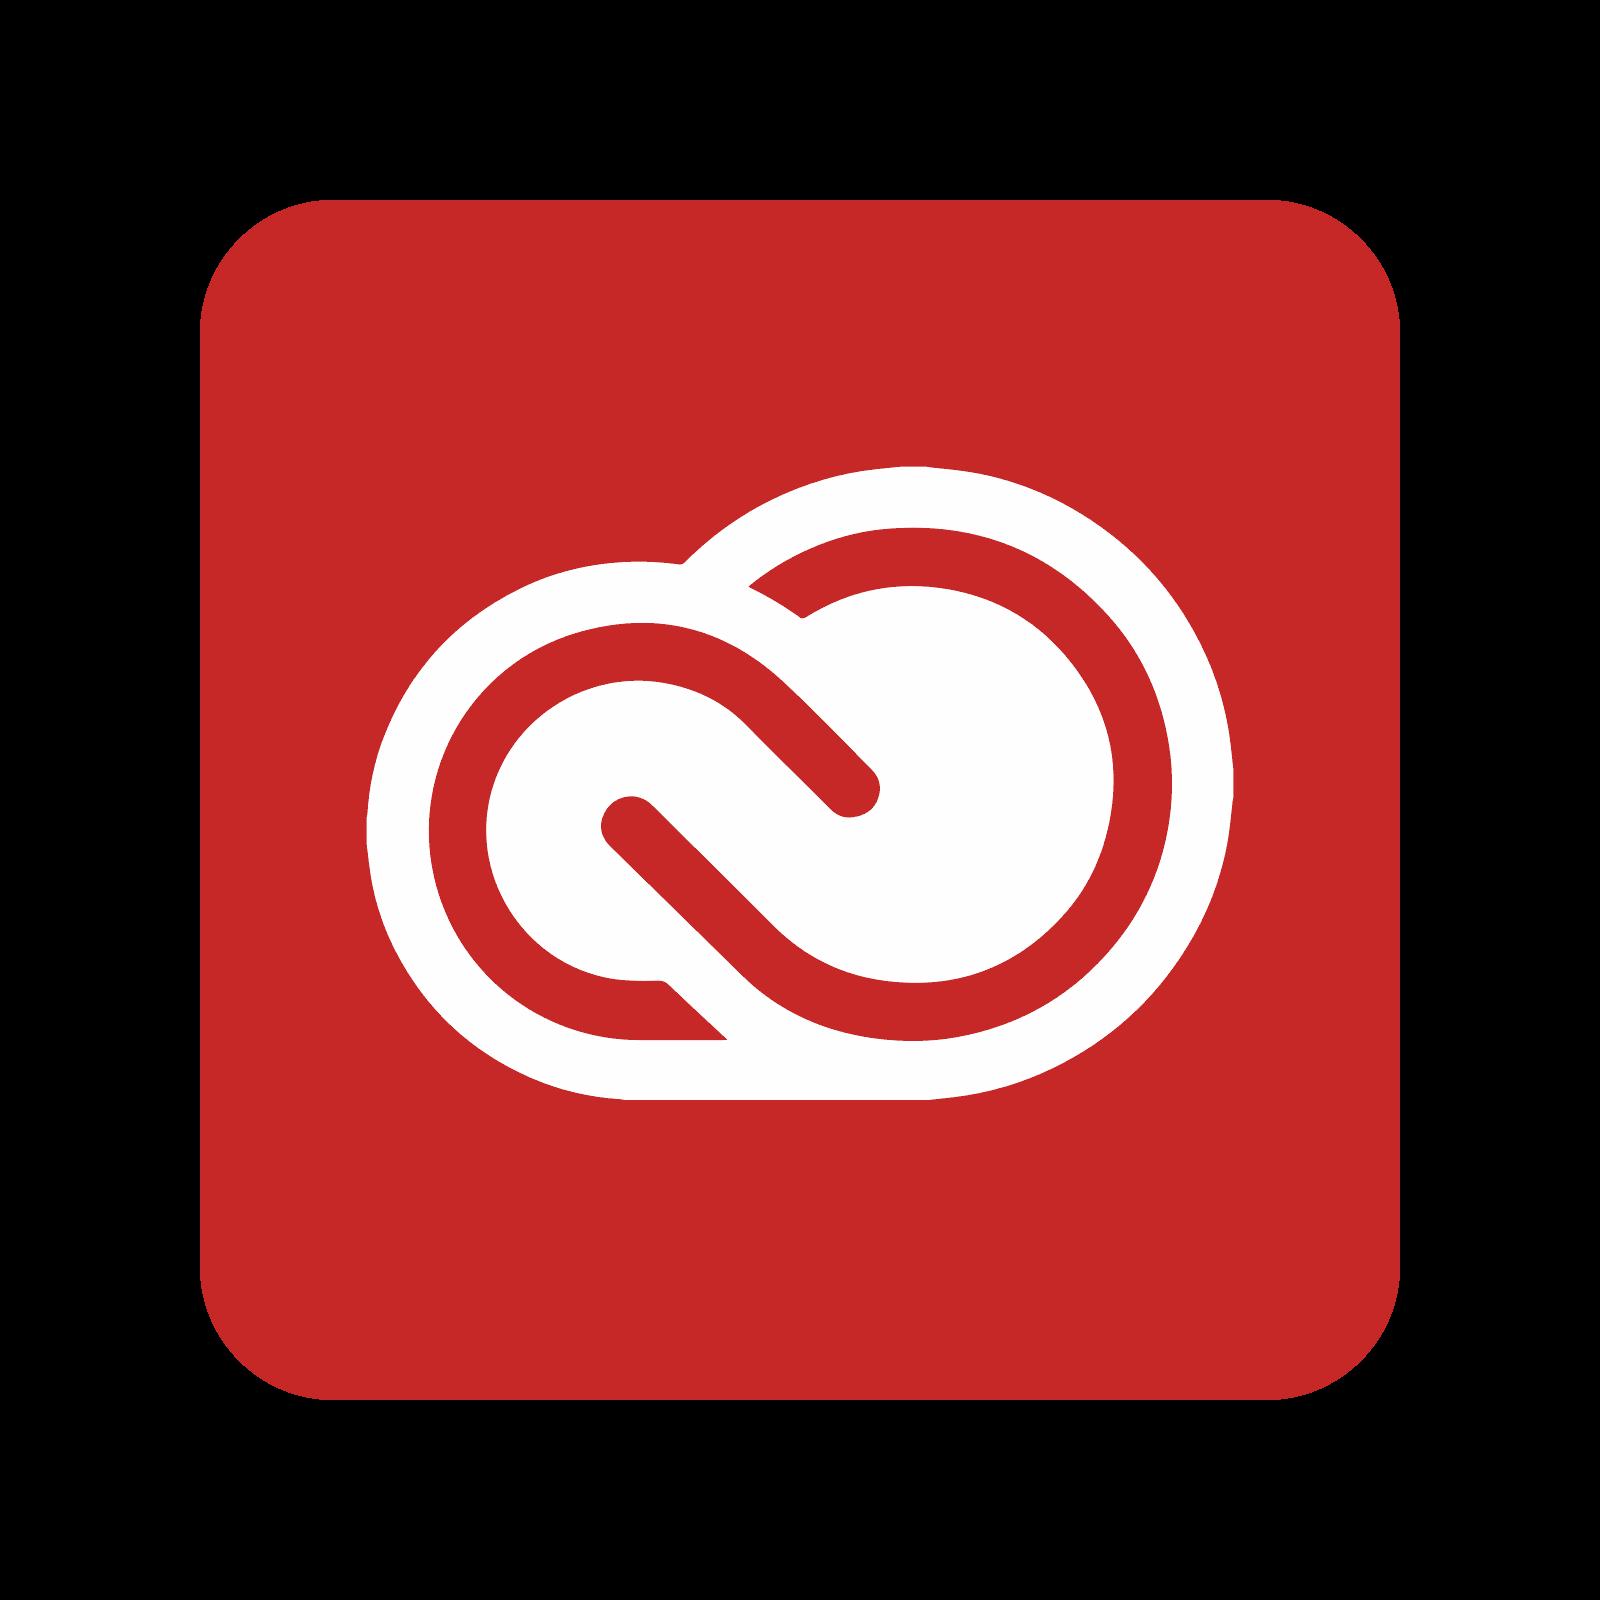 freeuse stock Adobe cloud icon free. Vector color creative